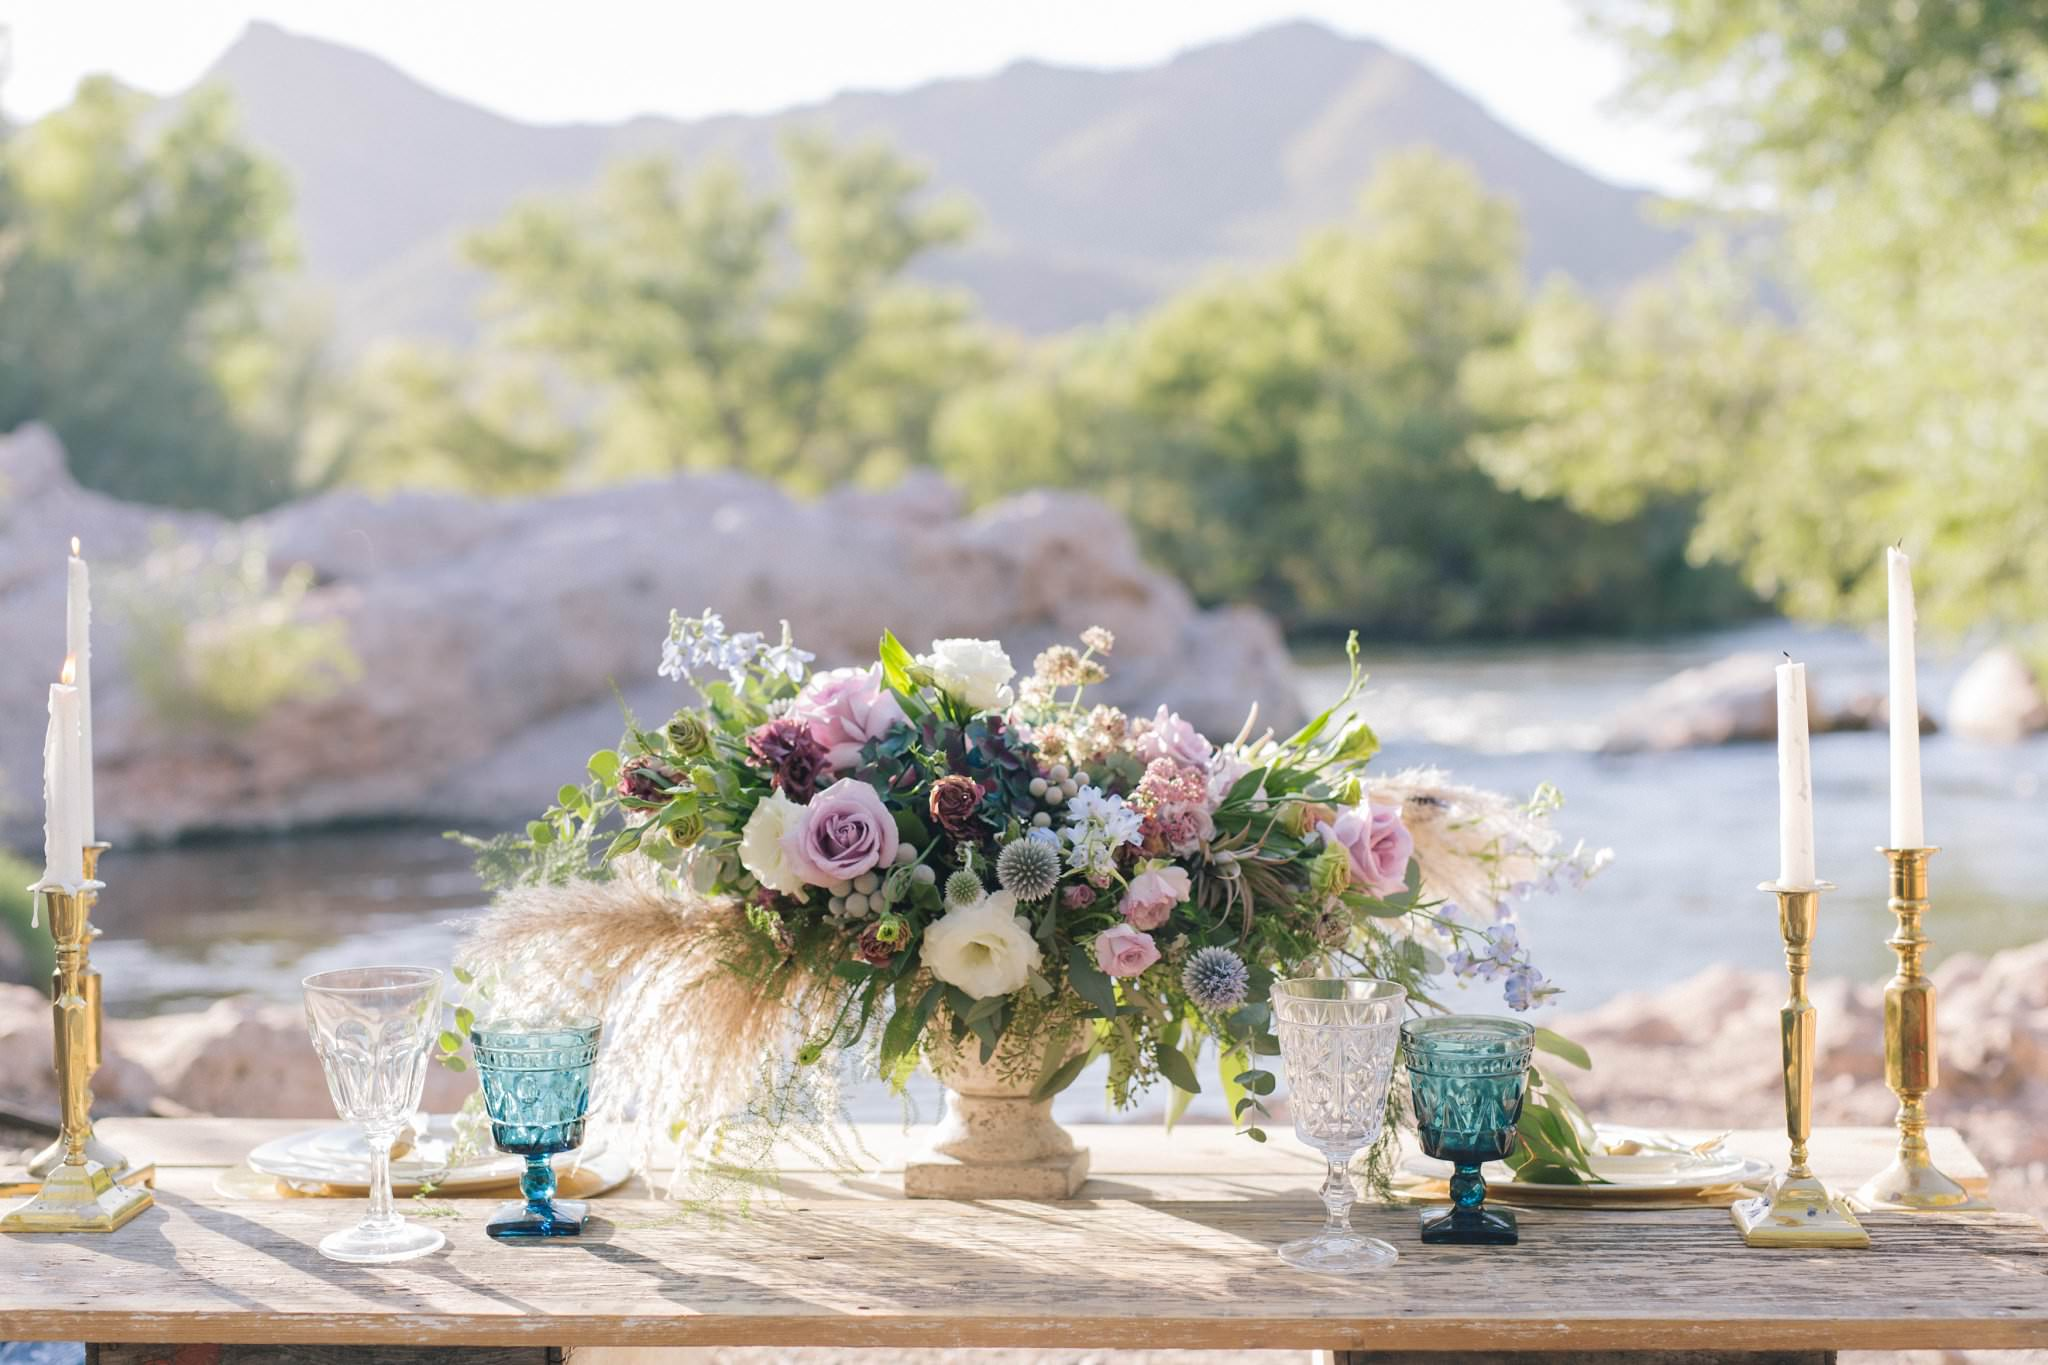 Arizona Salt River rustic wedding inspiration